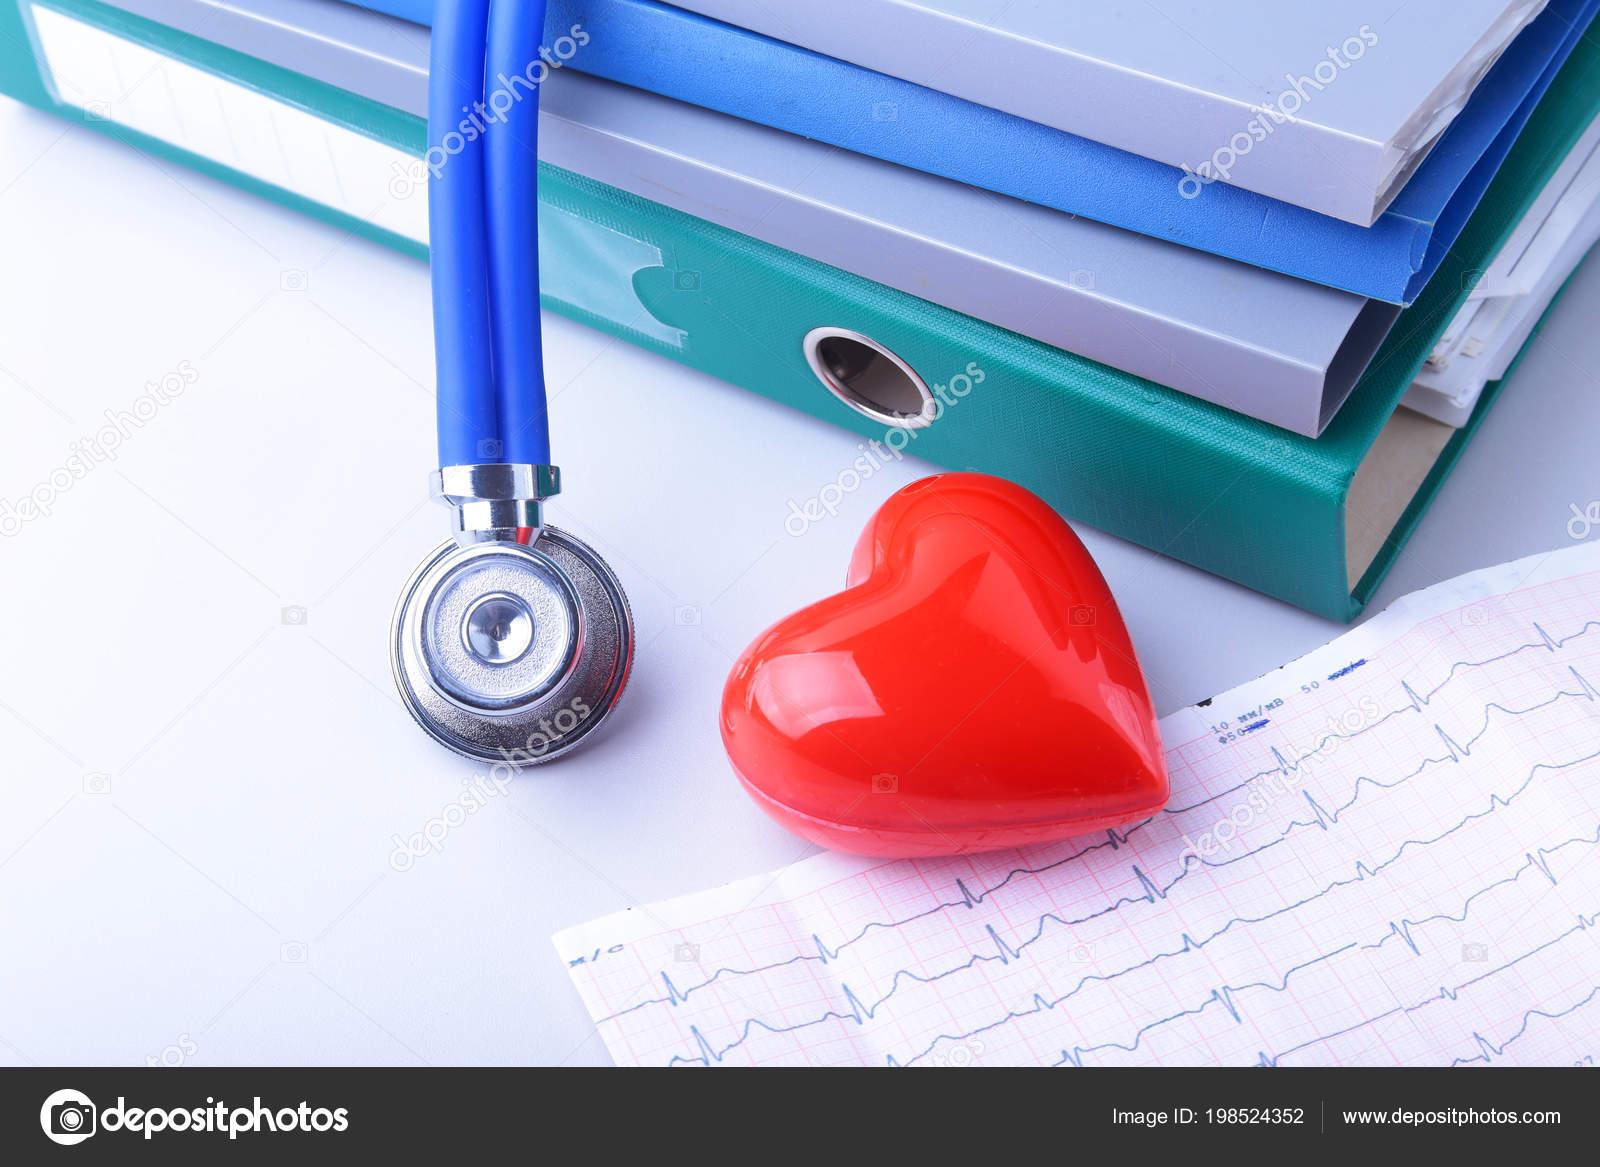 books folder file, stethoscope, red heart and RX prescription